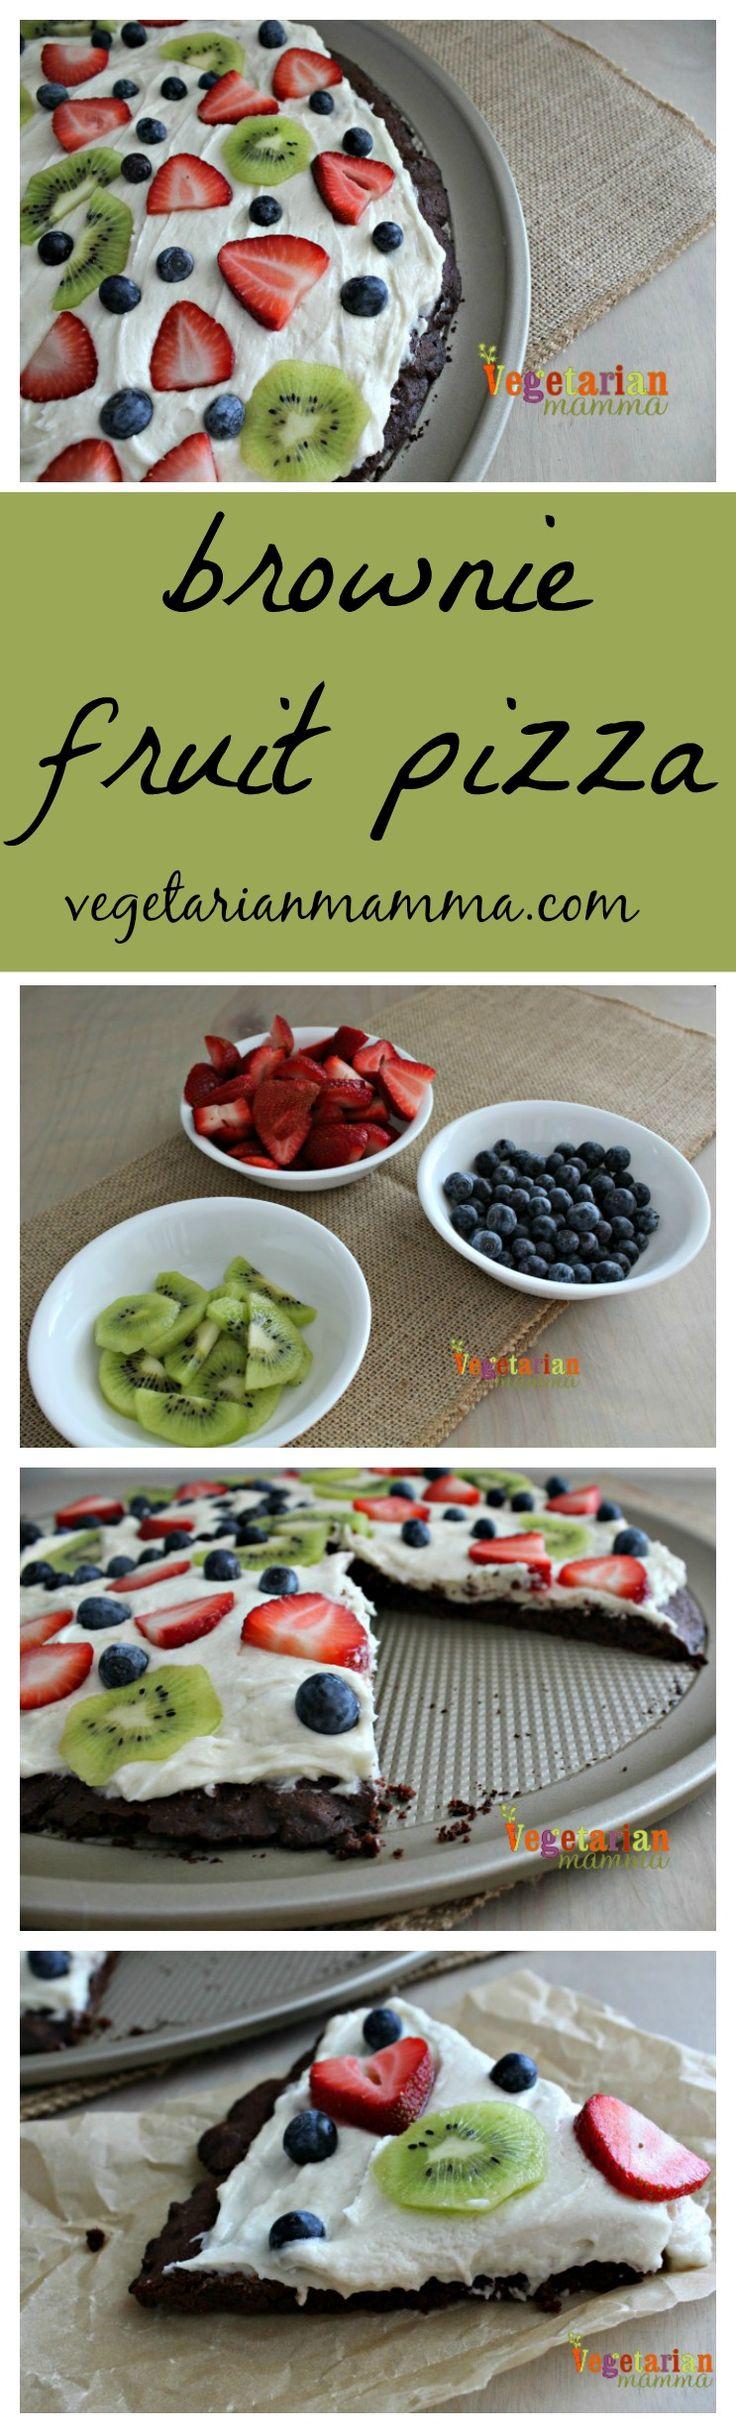 Brownie Fruit Pizza @Vegetarianmamma.com - #vegan #glutenfree #tothefullest #enjoylifefoods